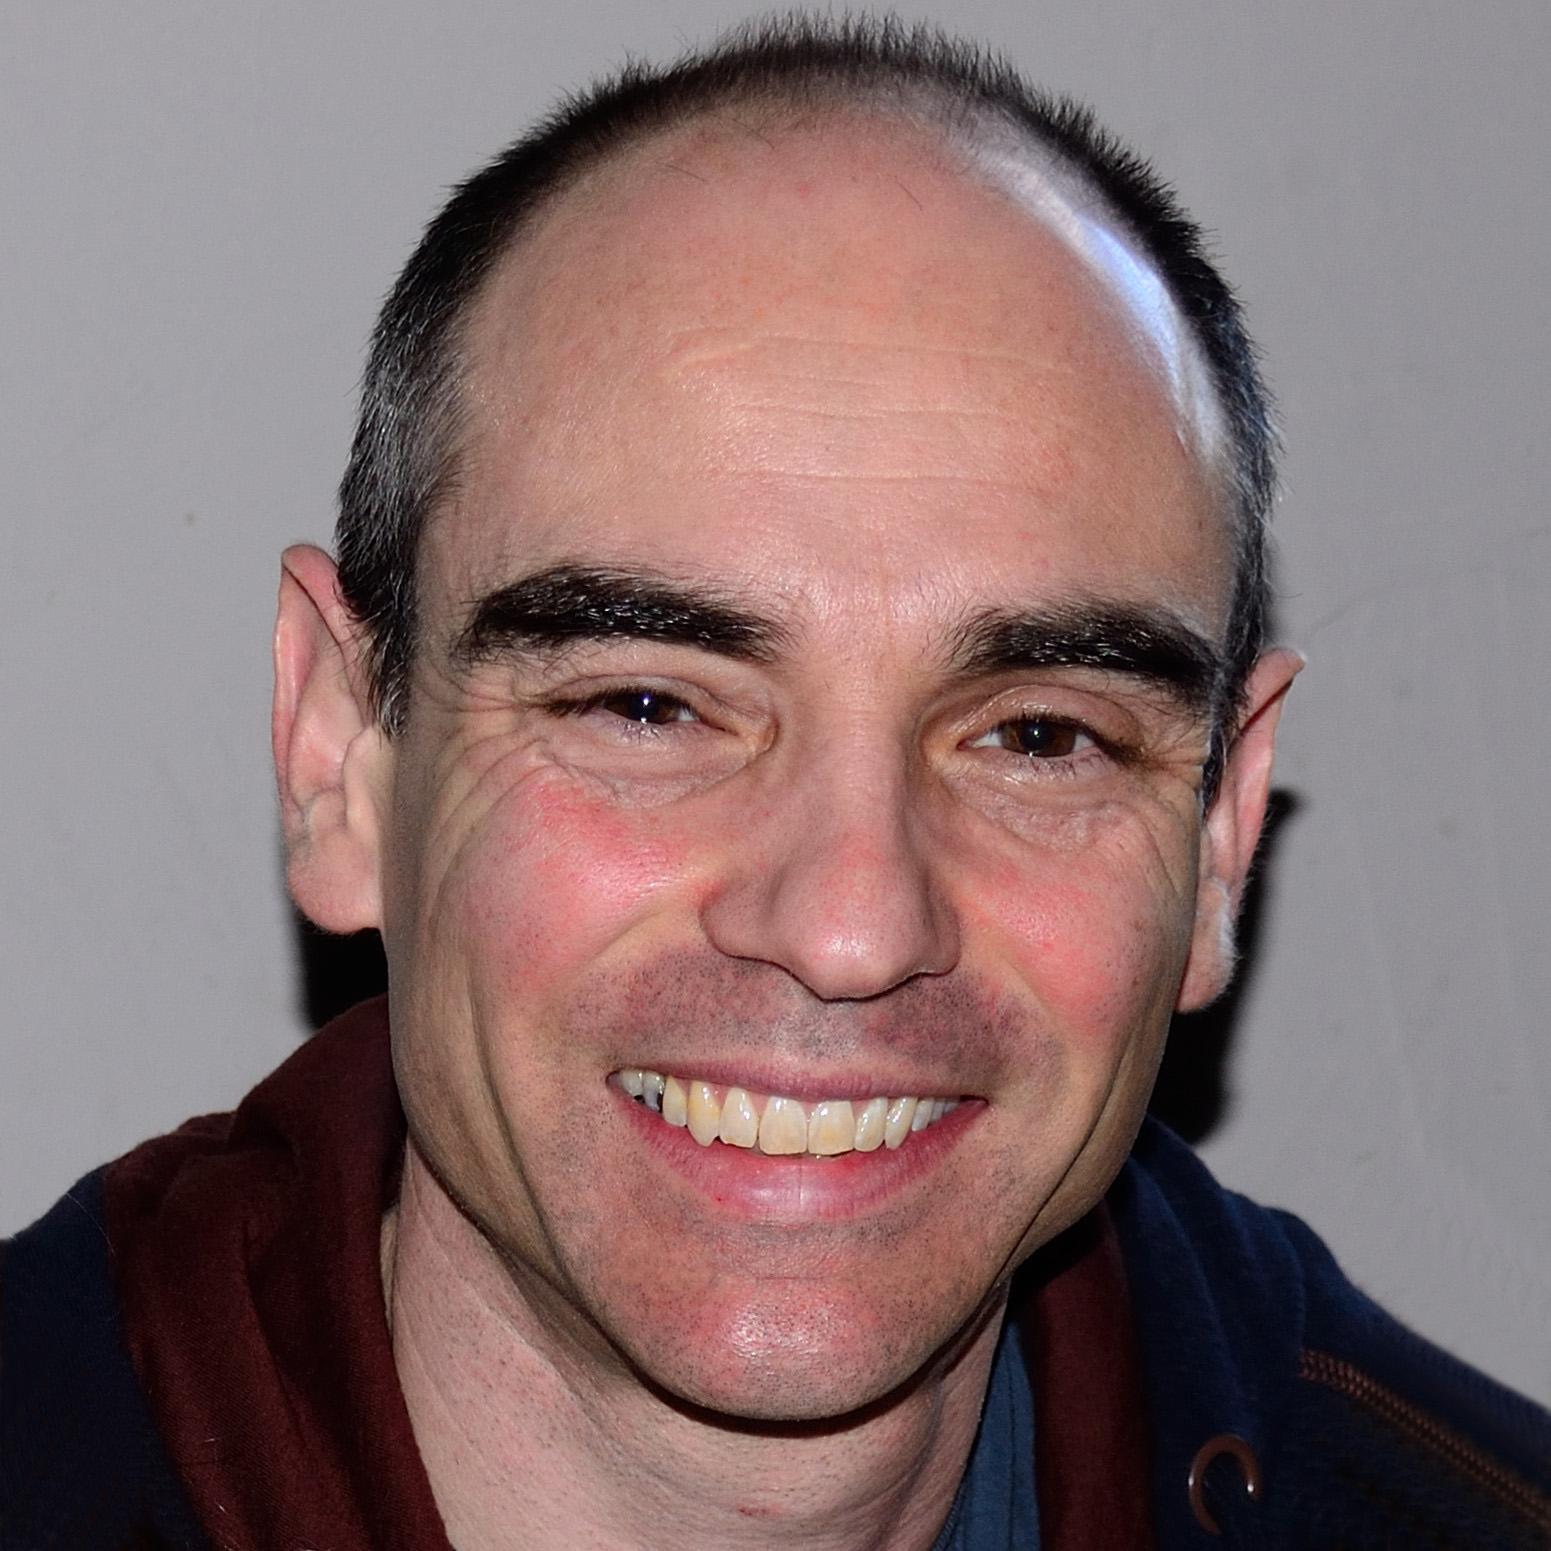 Dr Nicholas Jakubovics smiling